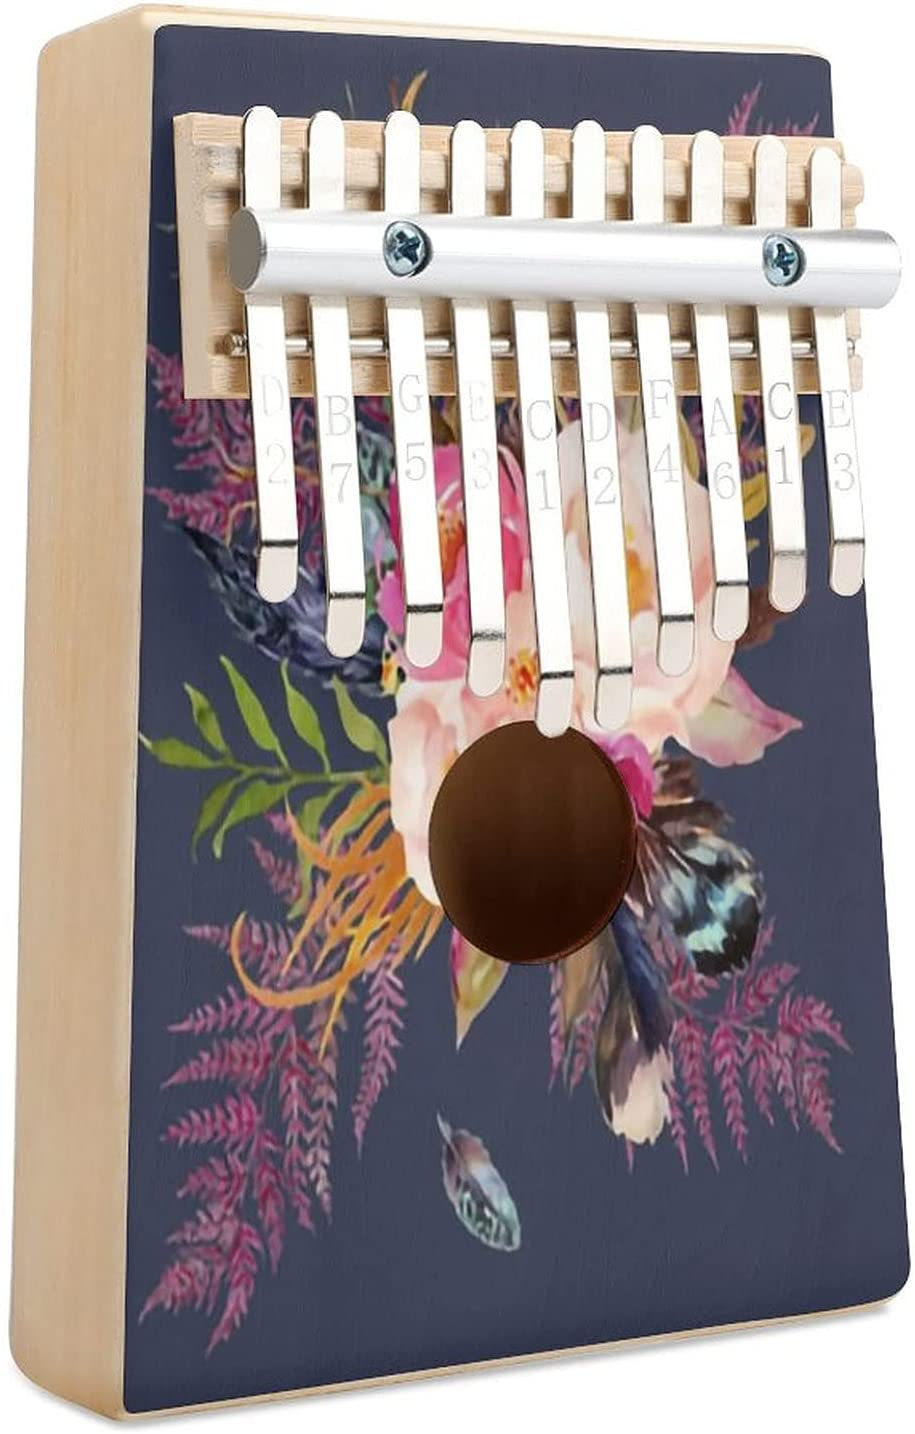 Deep Love Fq Blue Sale Kalimba Thumb Finger 10 Ranking TOP14 Musica Piano Key